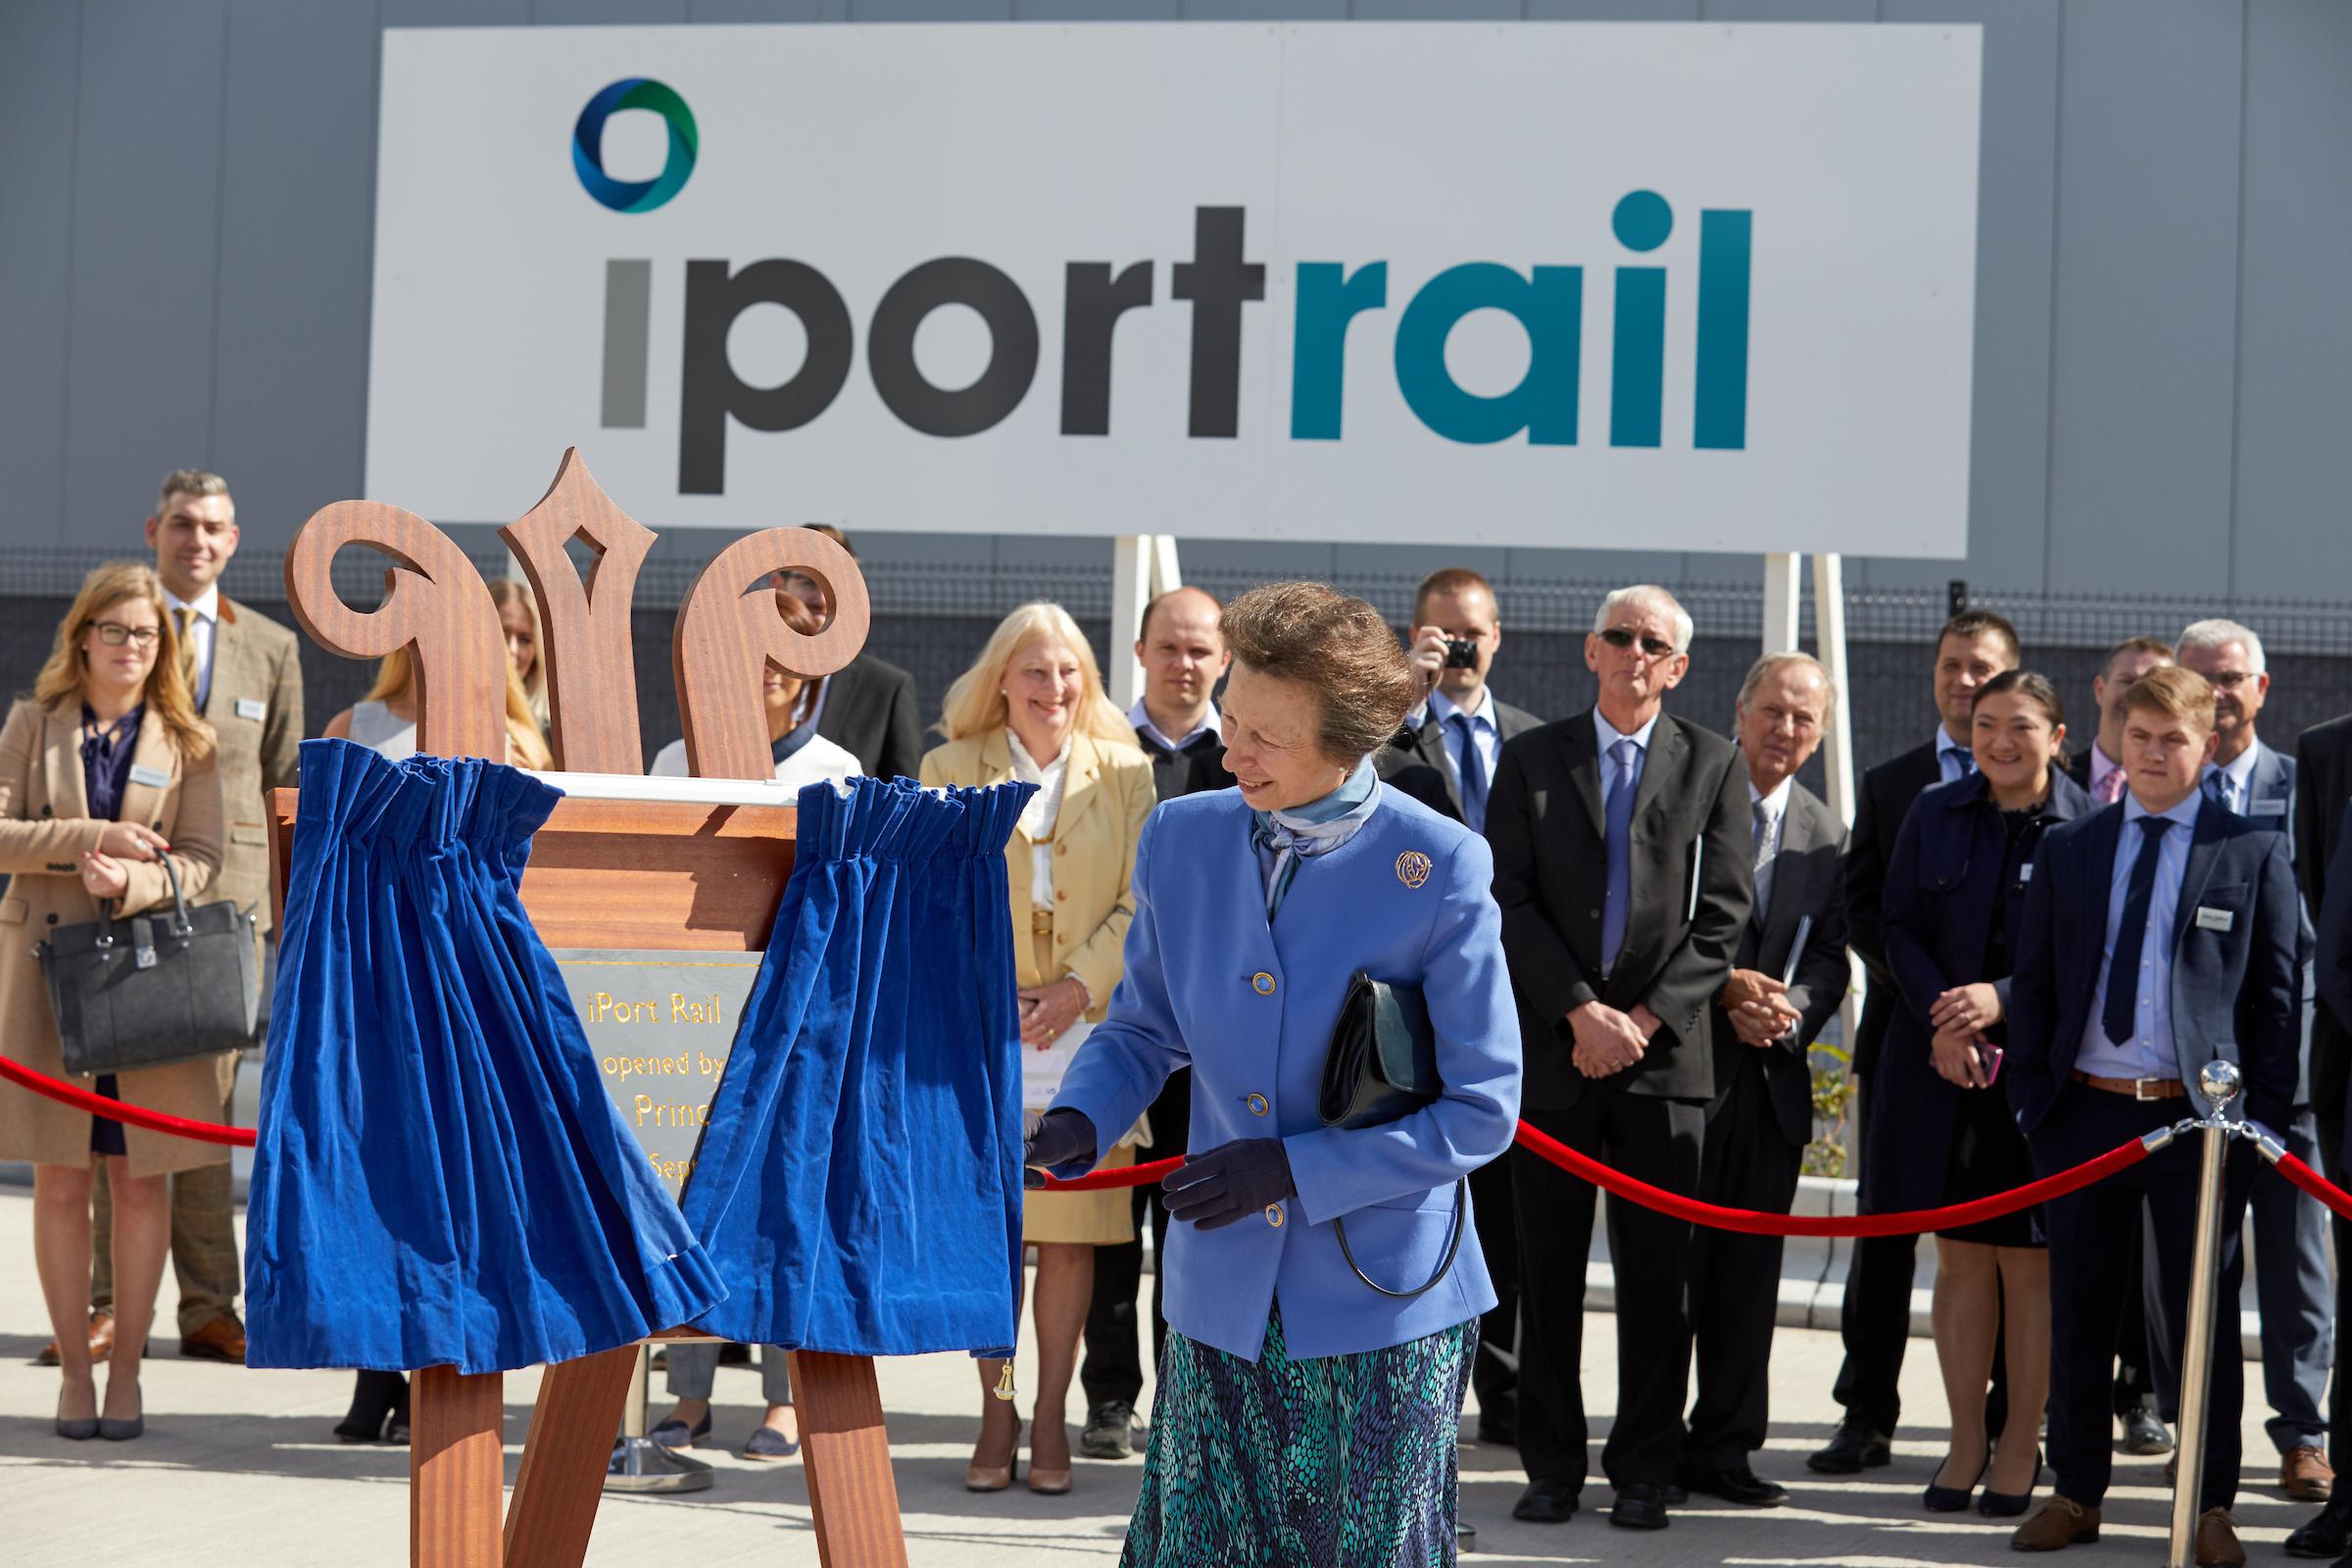 110 sf princess royal iport opening 1 iPort Rail